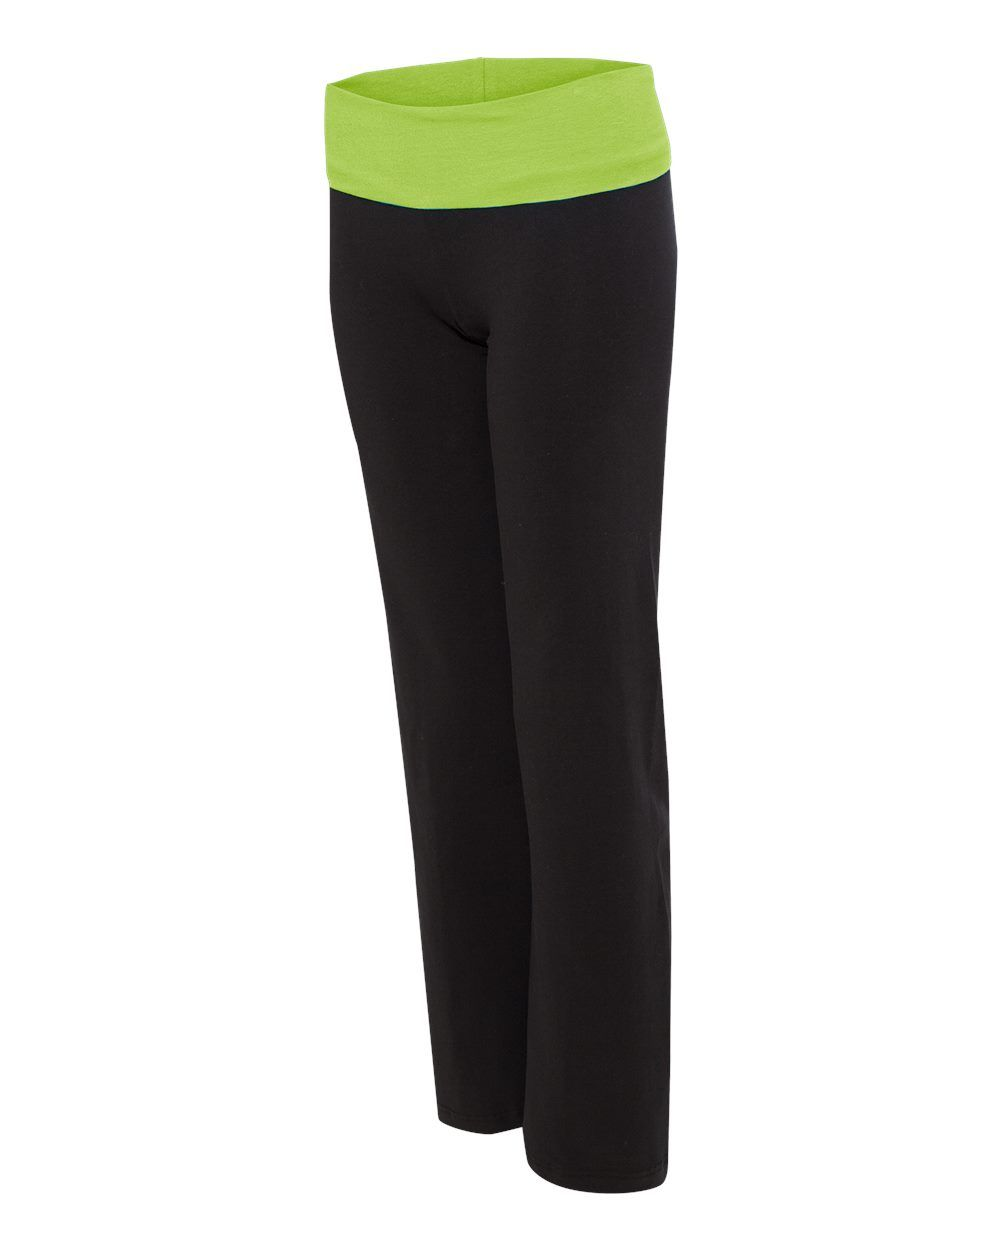 19+ Yoga pants with fold down waist inspirations